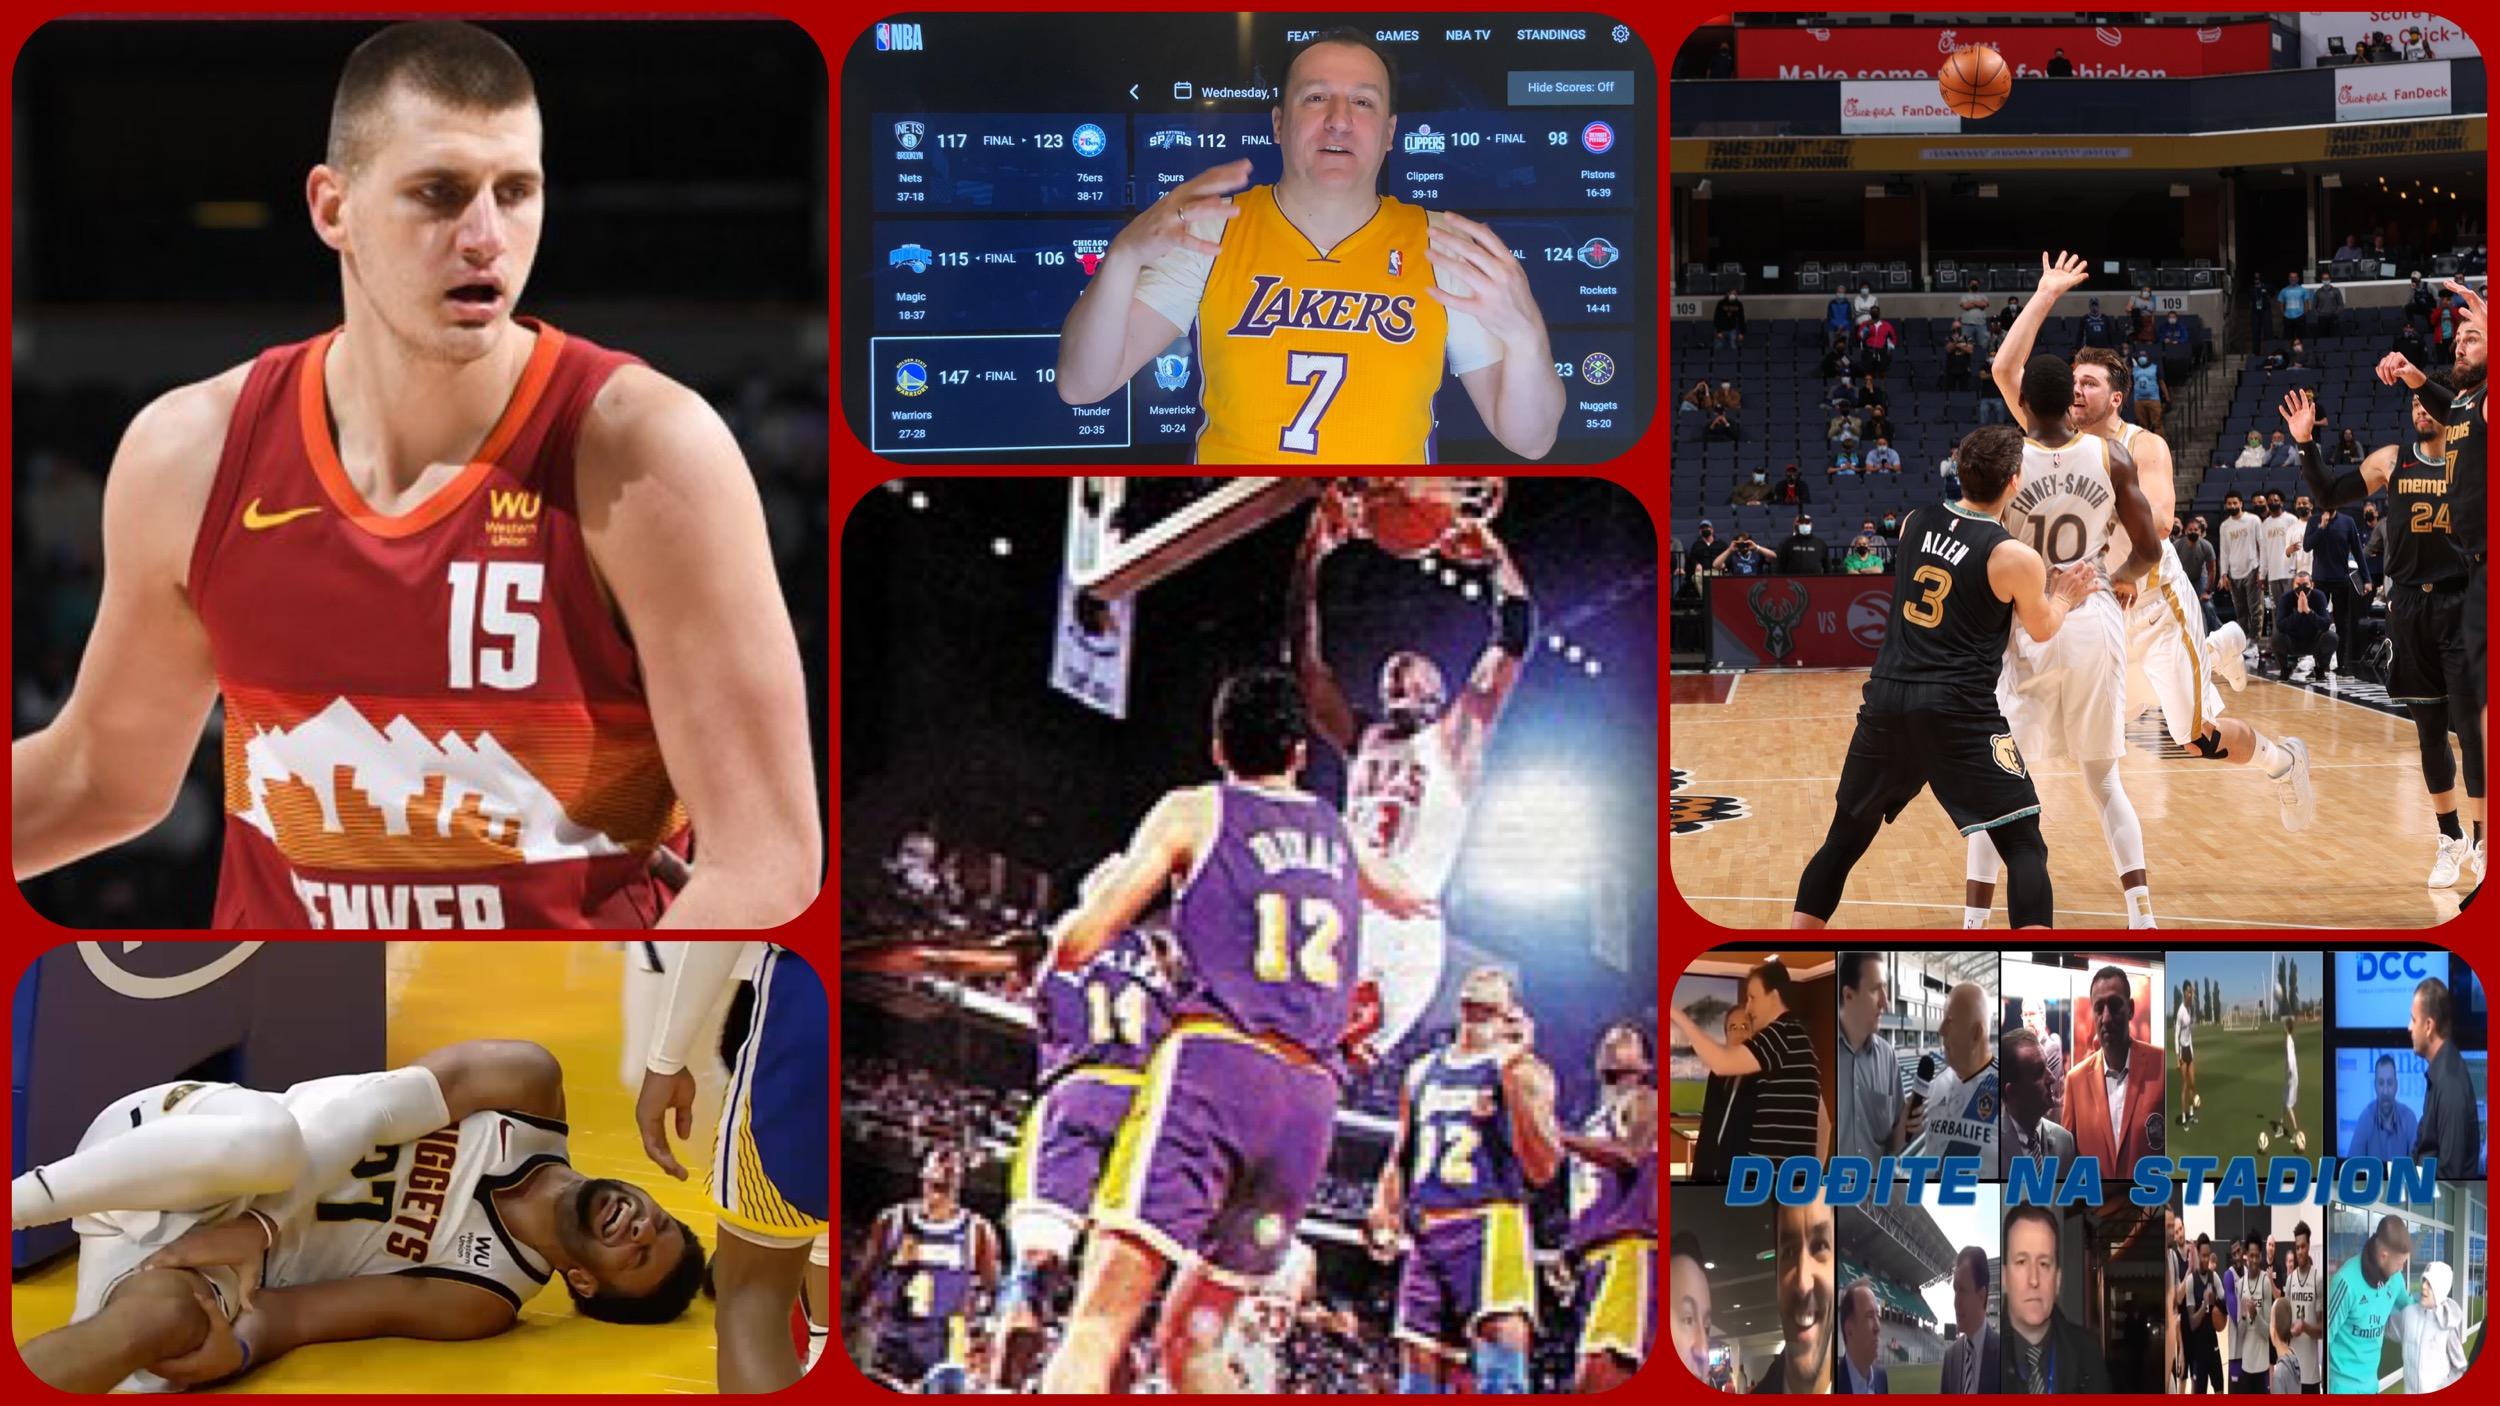 NBA Specijal: Denver pod udarom povreda i nepoznata srpska priča o Lejkersima (VIDEO)